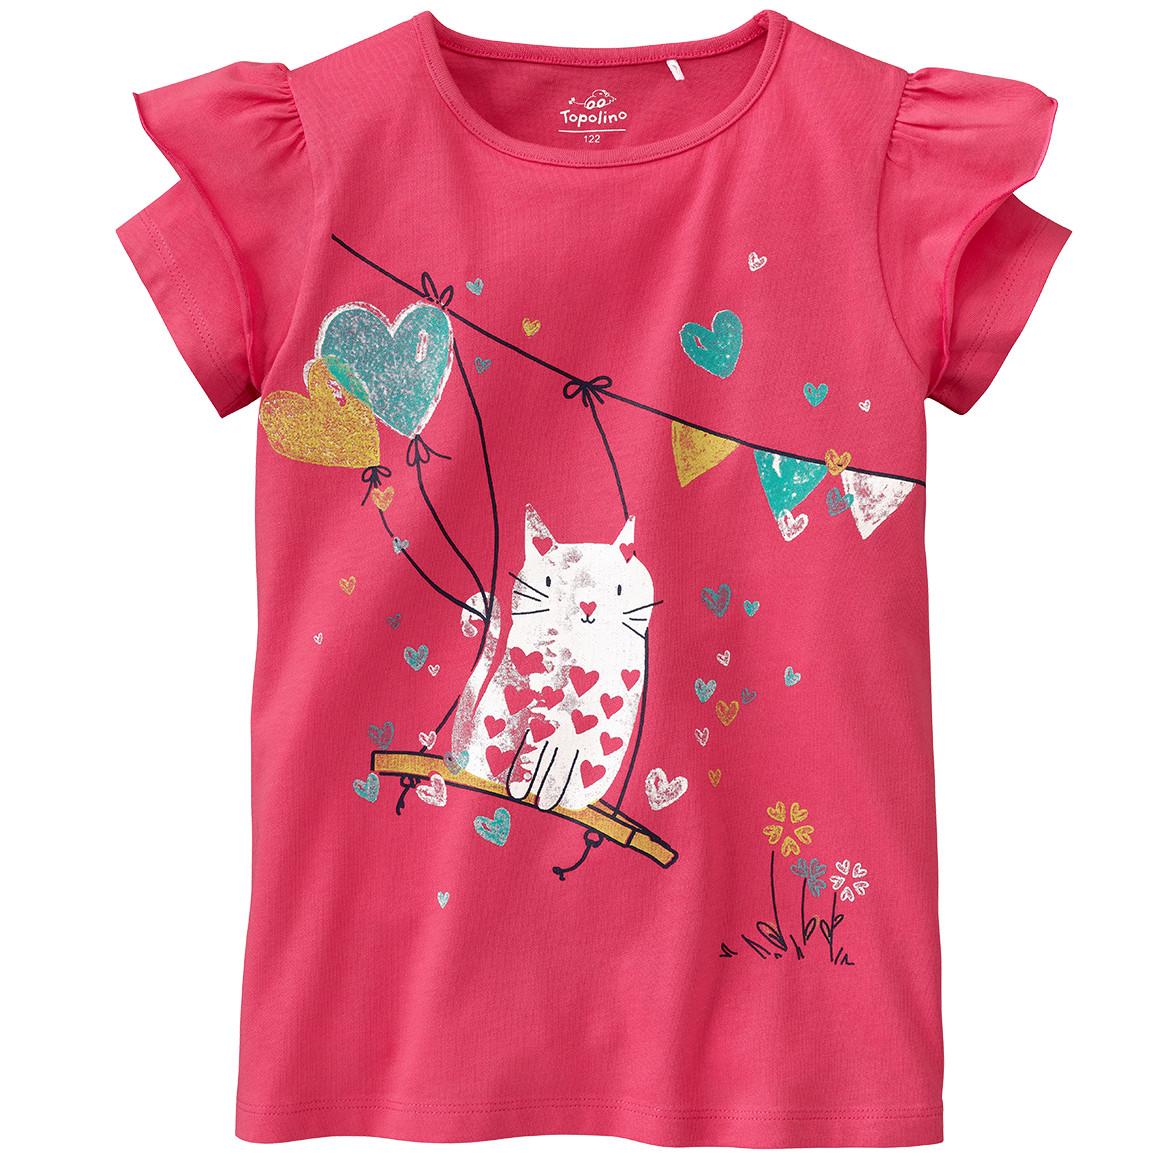 Mädchen T-Shirt mit Katzen Motiv